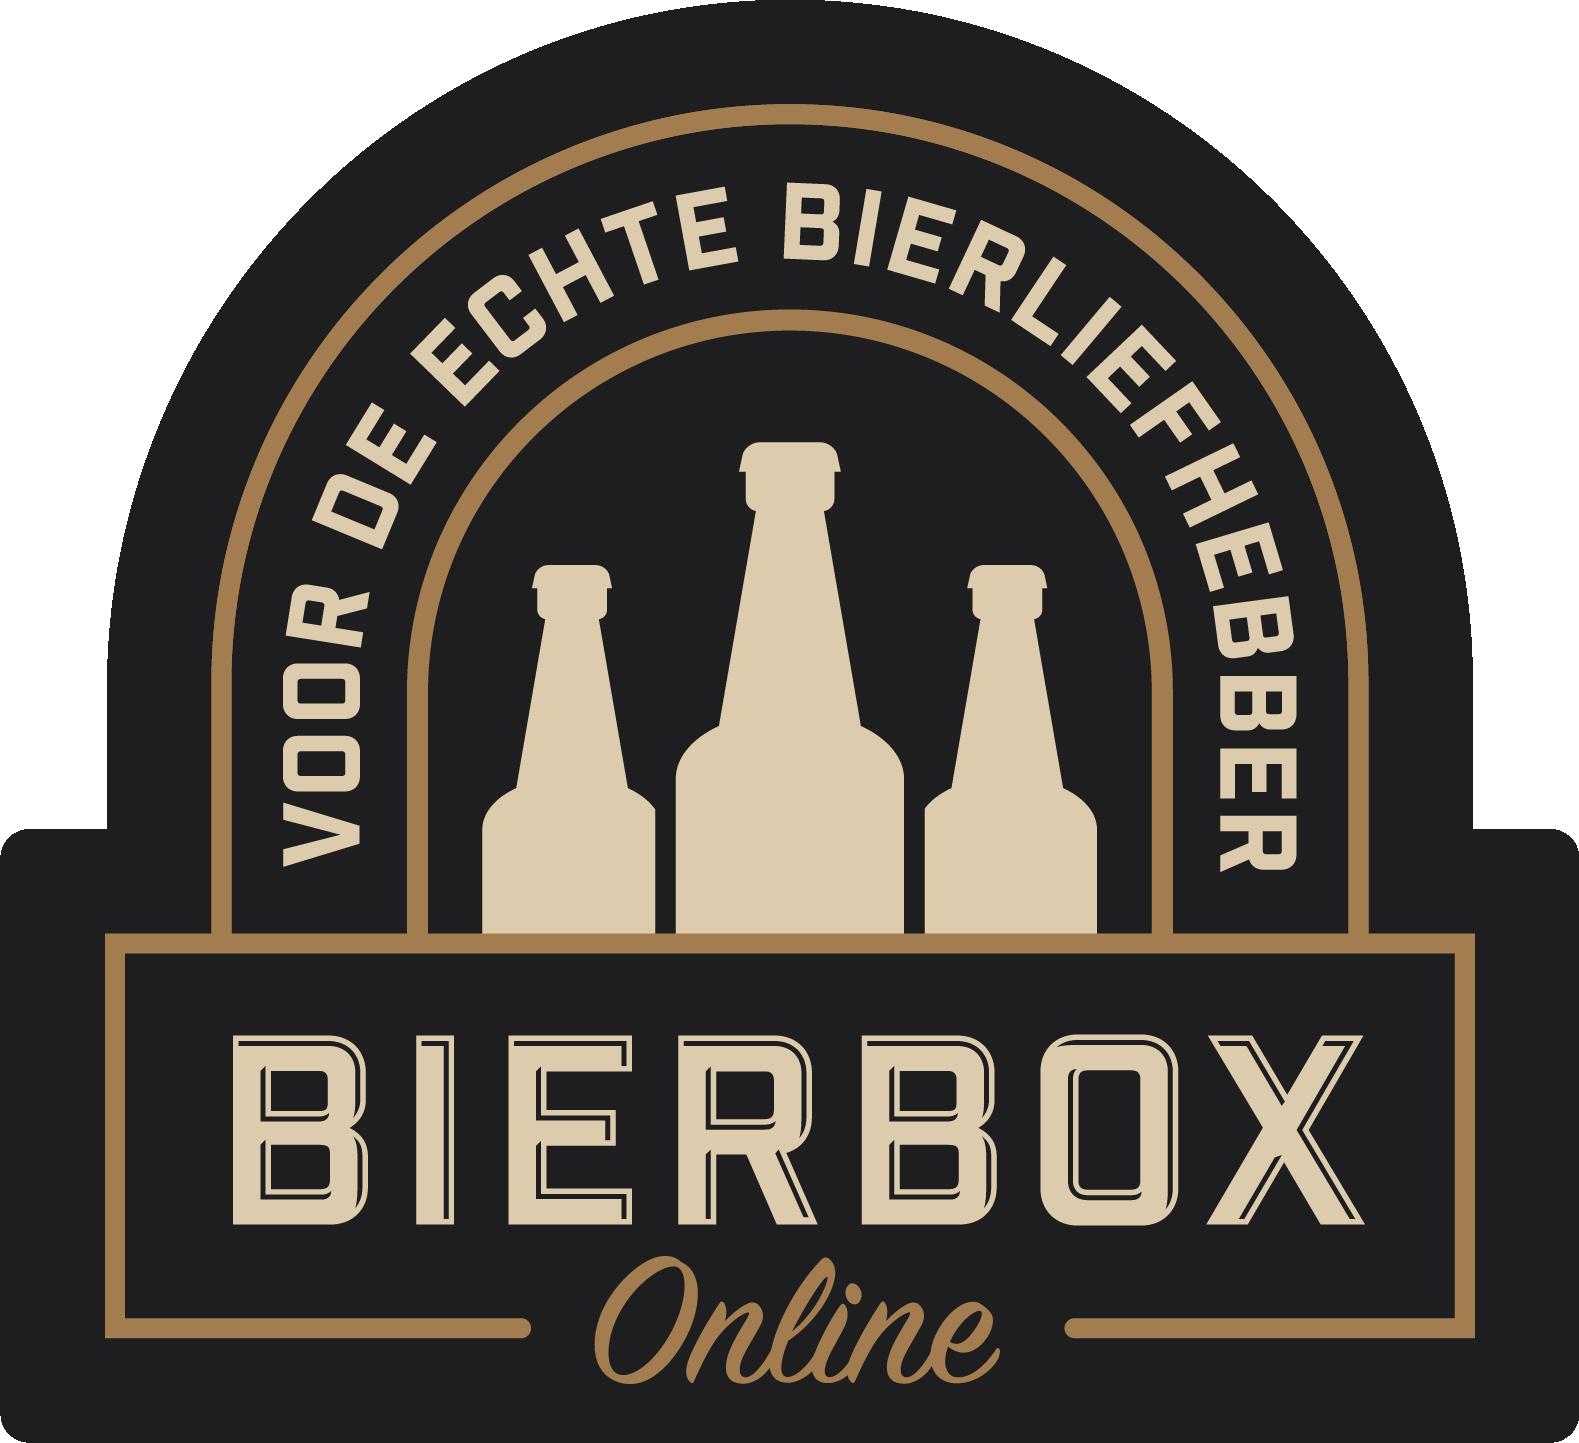 Bierboxonline.nl